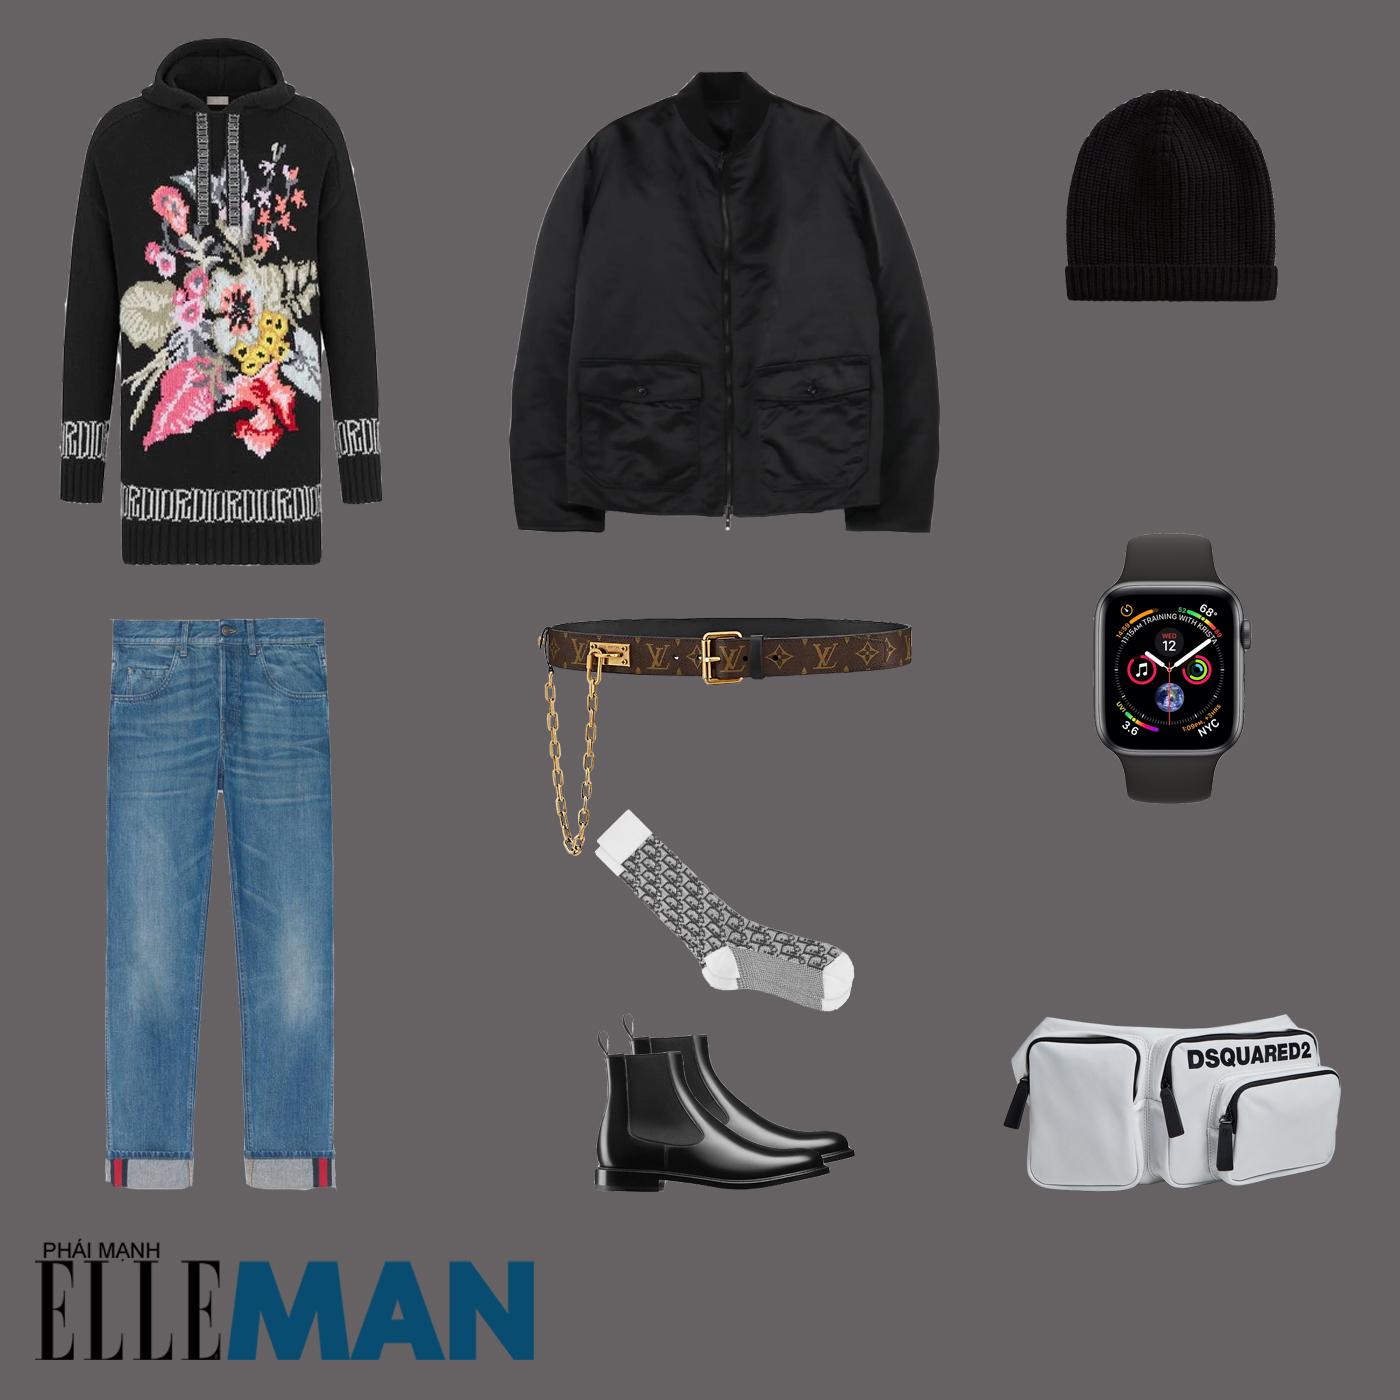 outfit 2 - phong cách ametora